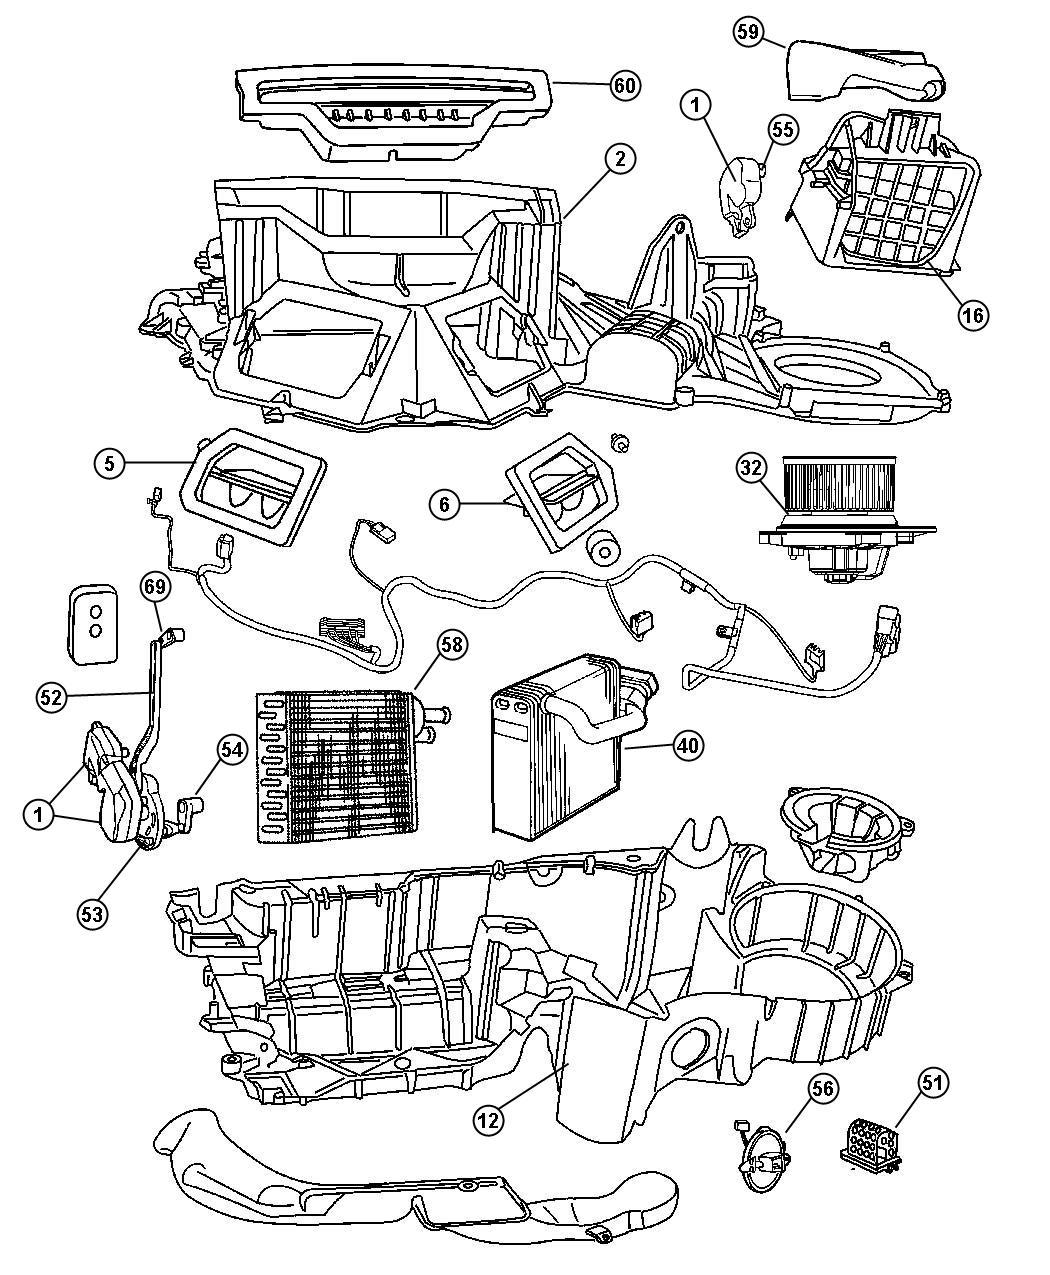 2004 dodge dakota heater and air conditioning unit